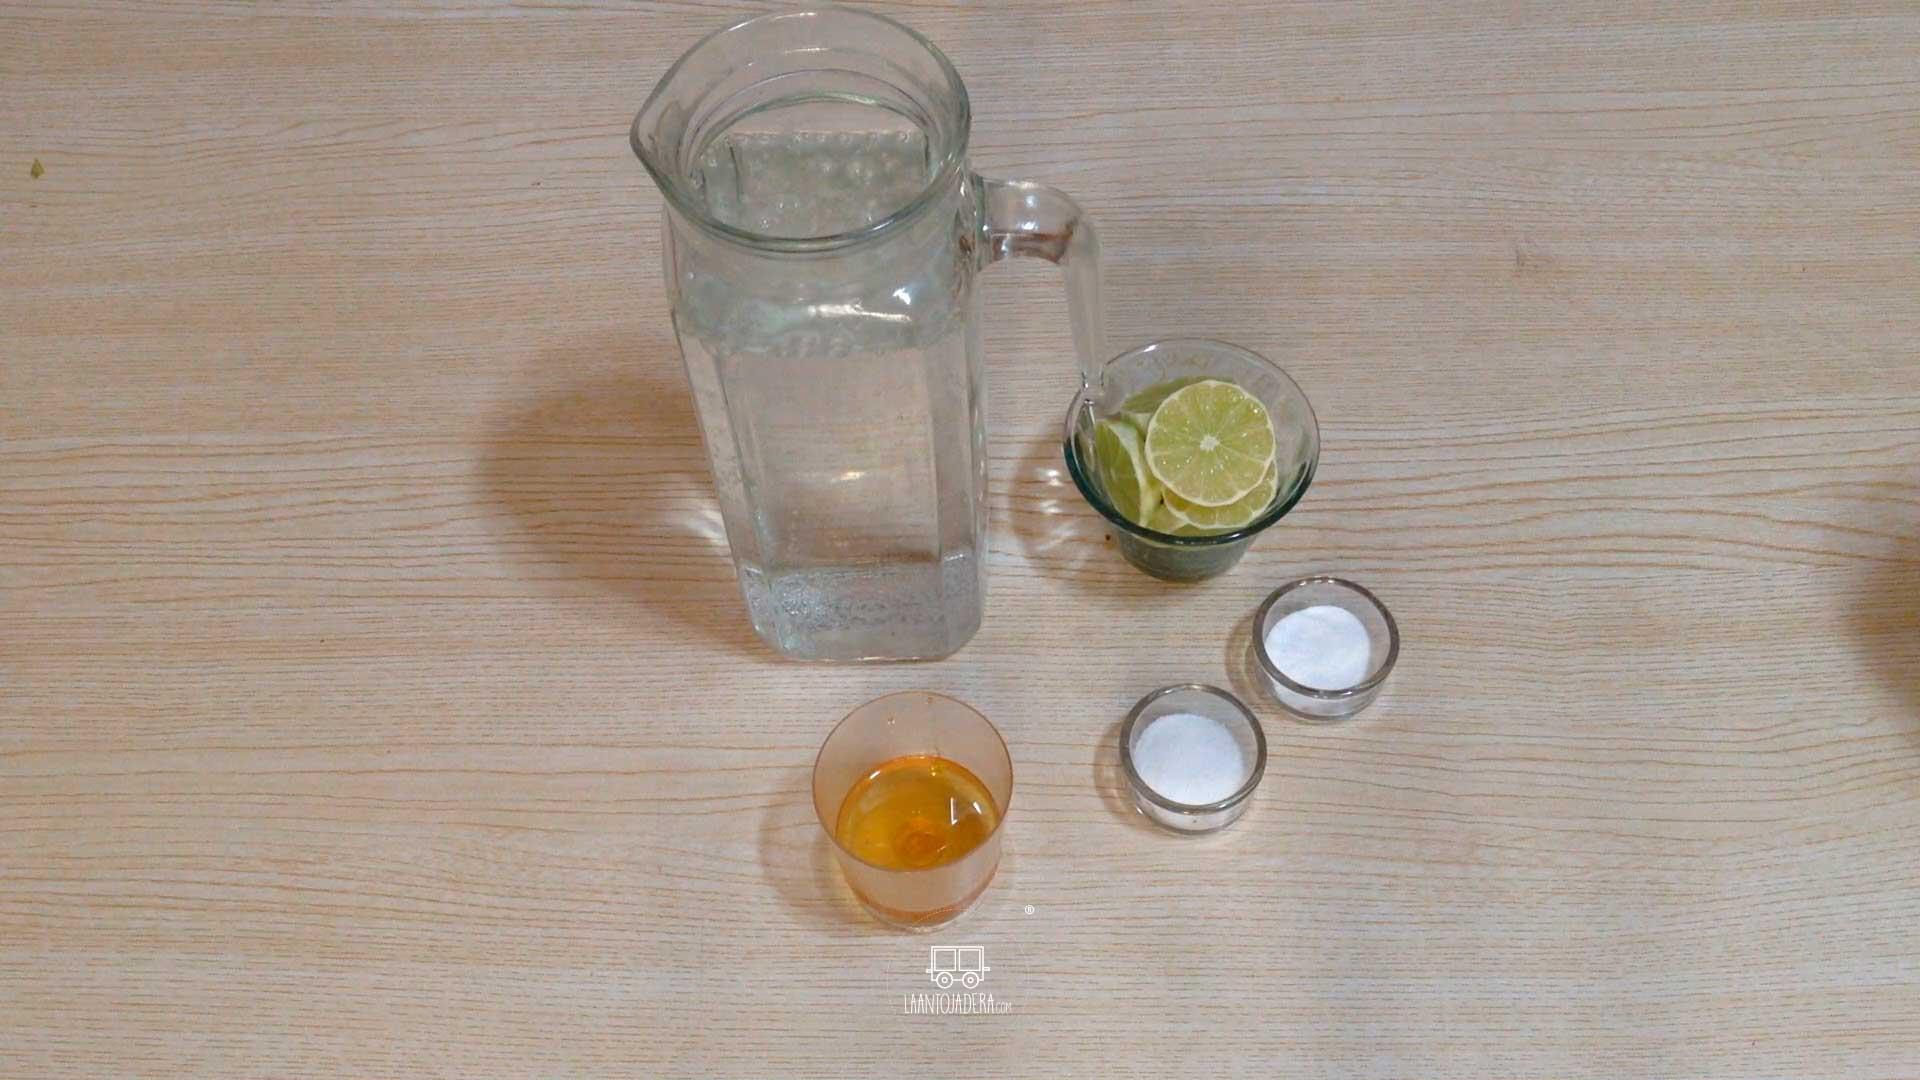 La Antojadera | Agua Detox